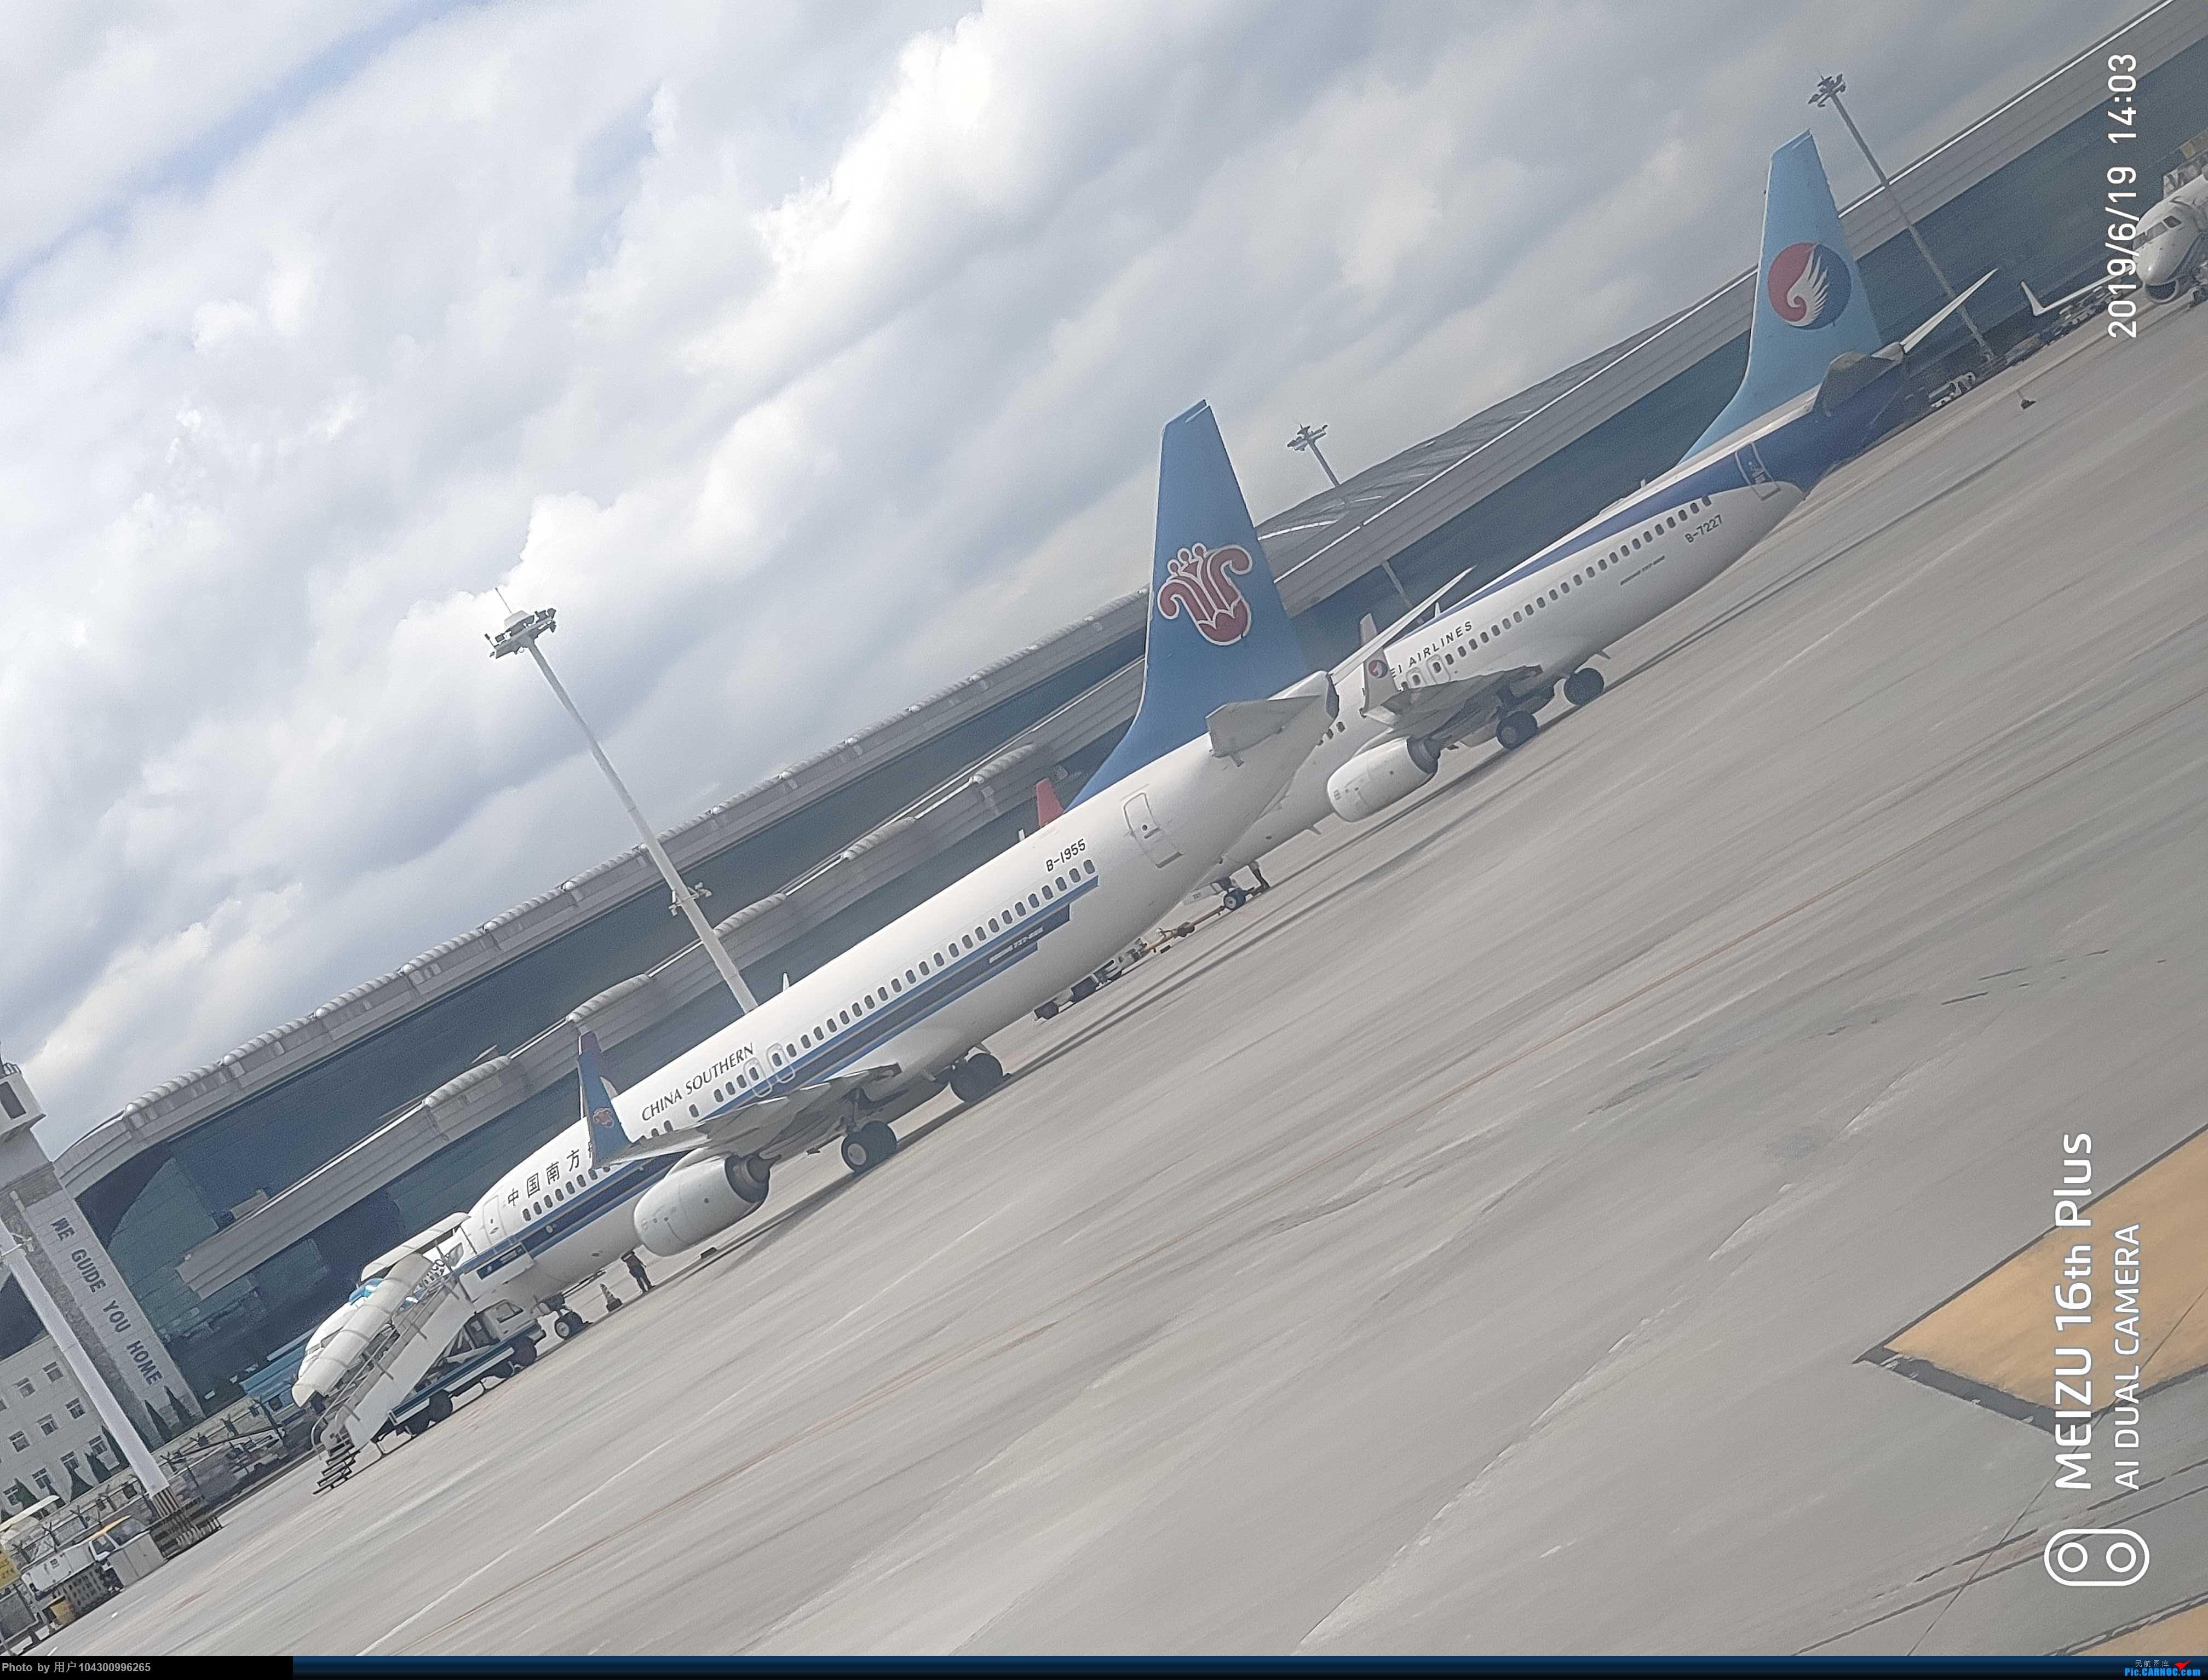 Re:[原创]DM哥飞行游记--贵阳往返荔波2日游 BOEING 737-800 B-1955 中国贵阳龙洞堡国际机场